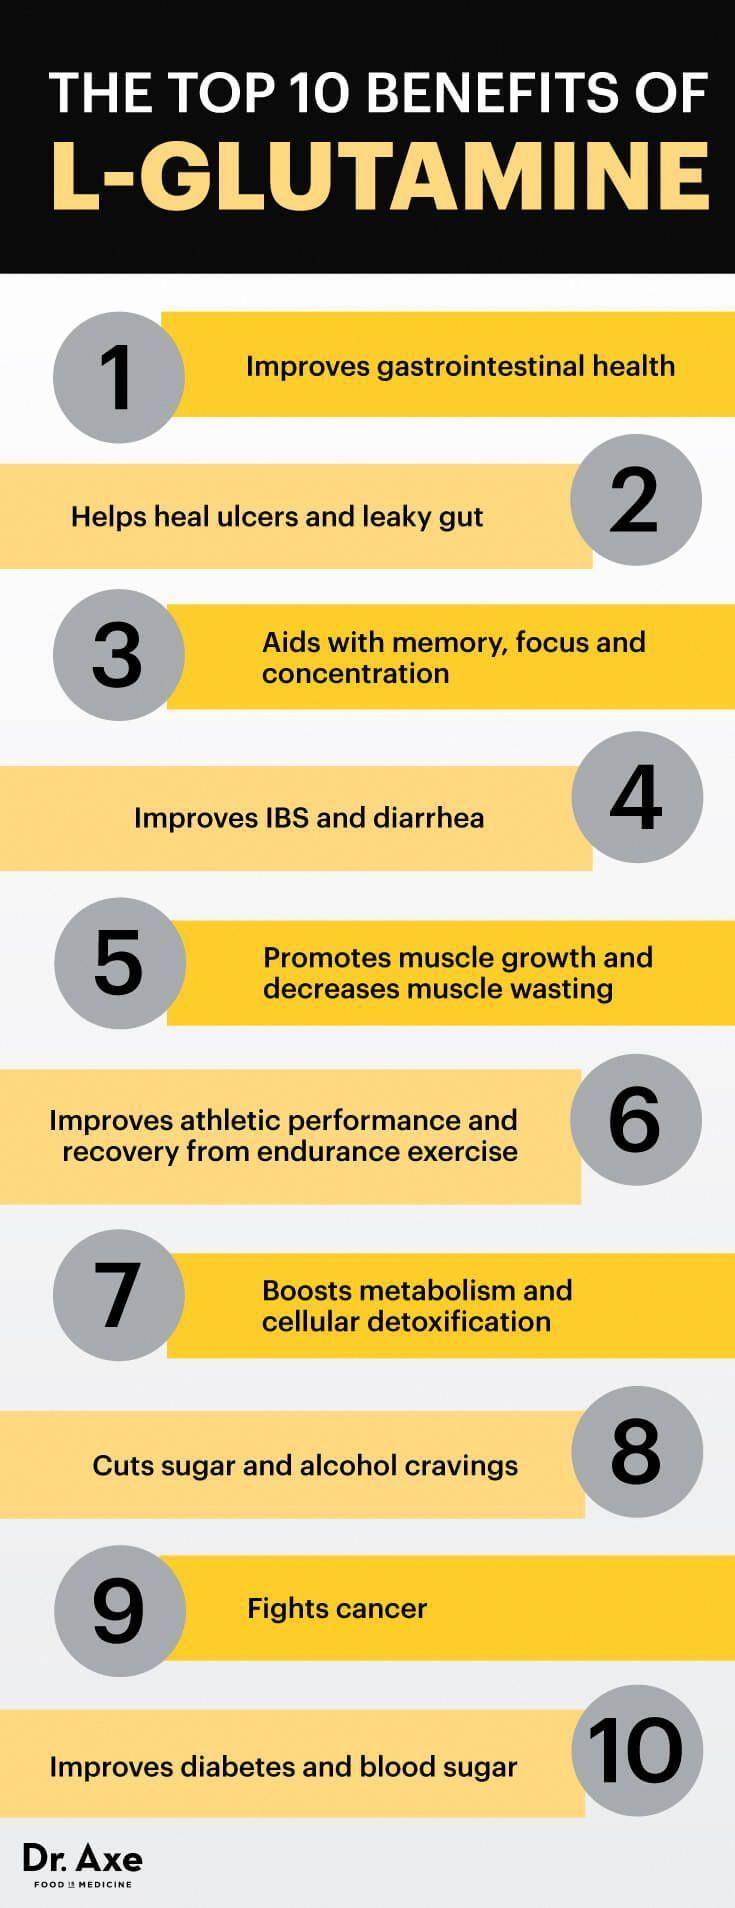 10 L-Glutamine Benefits, Side Effects & Dosage - Dr. Axe #supplements #BananaDiet